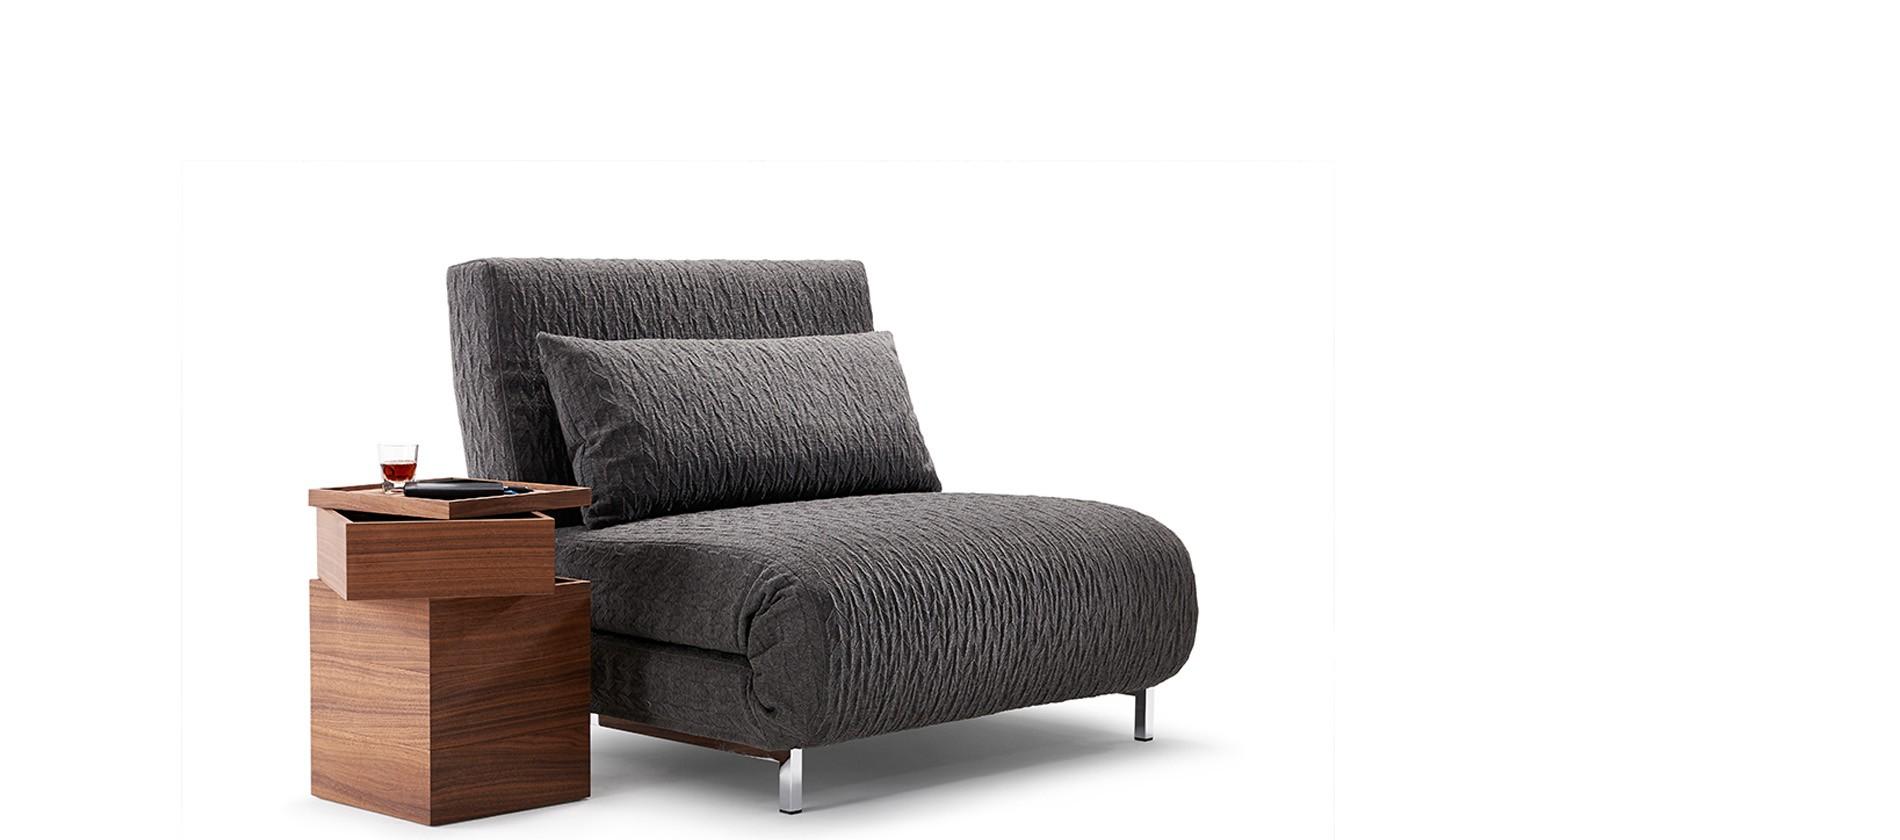 bettsofa pendo von signet sessel liege oder bequemes bett. Black Bedroom Furniture Sets. Home Design Ideas